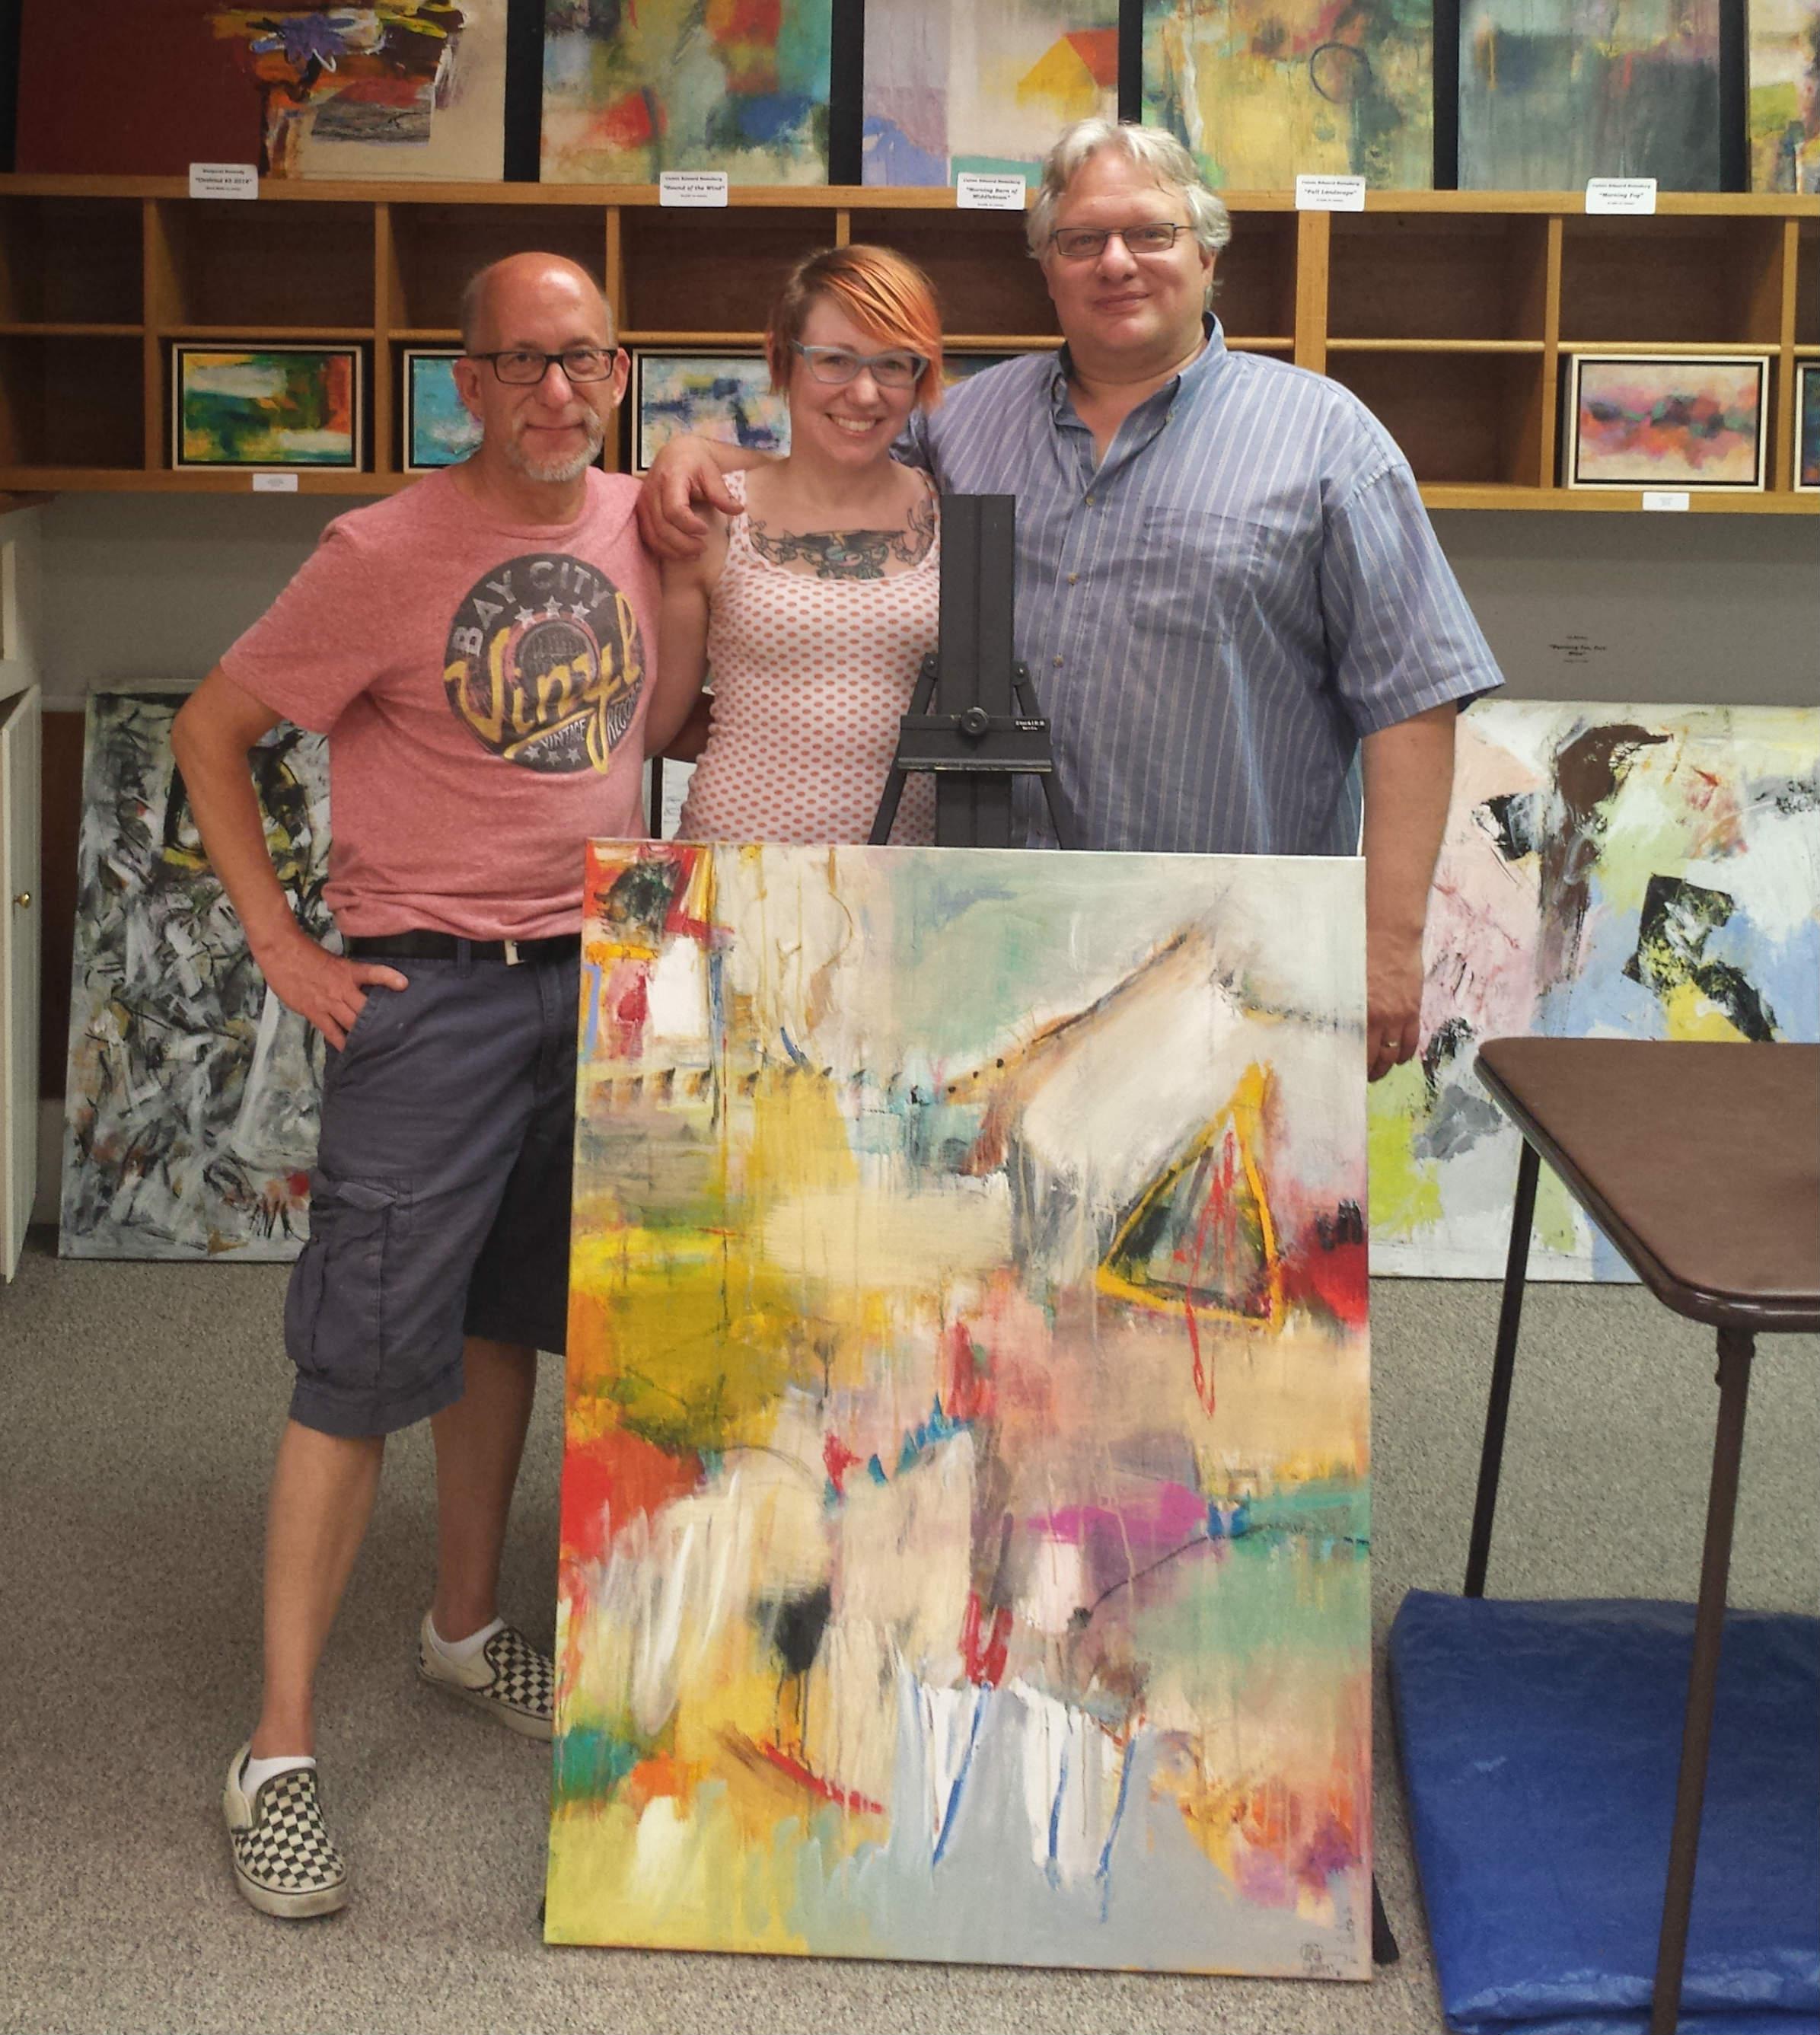 Ed Becker, Jennifer Butt, and Calvin Edward Ramsburg